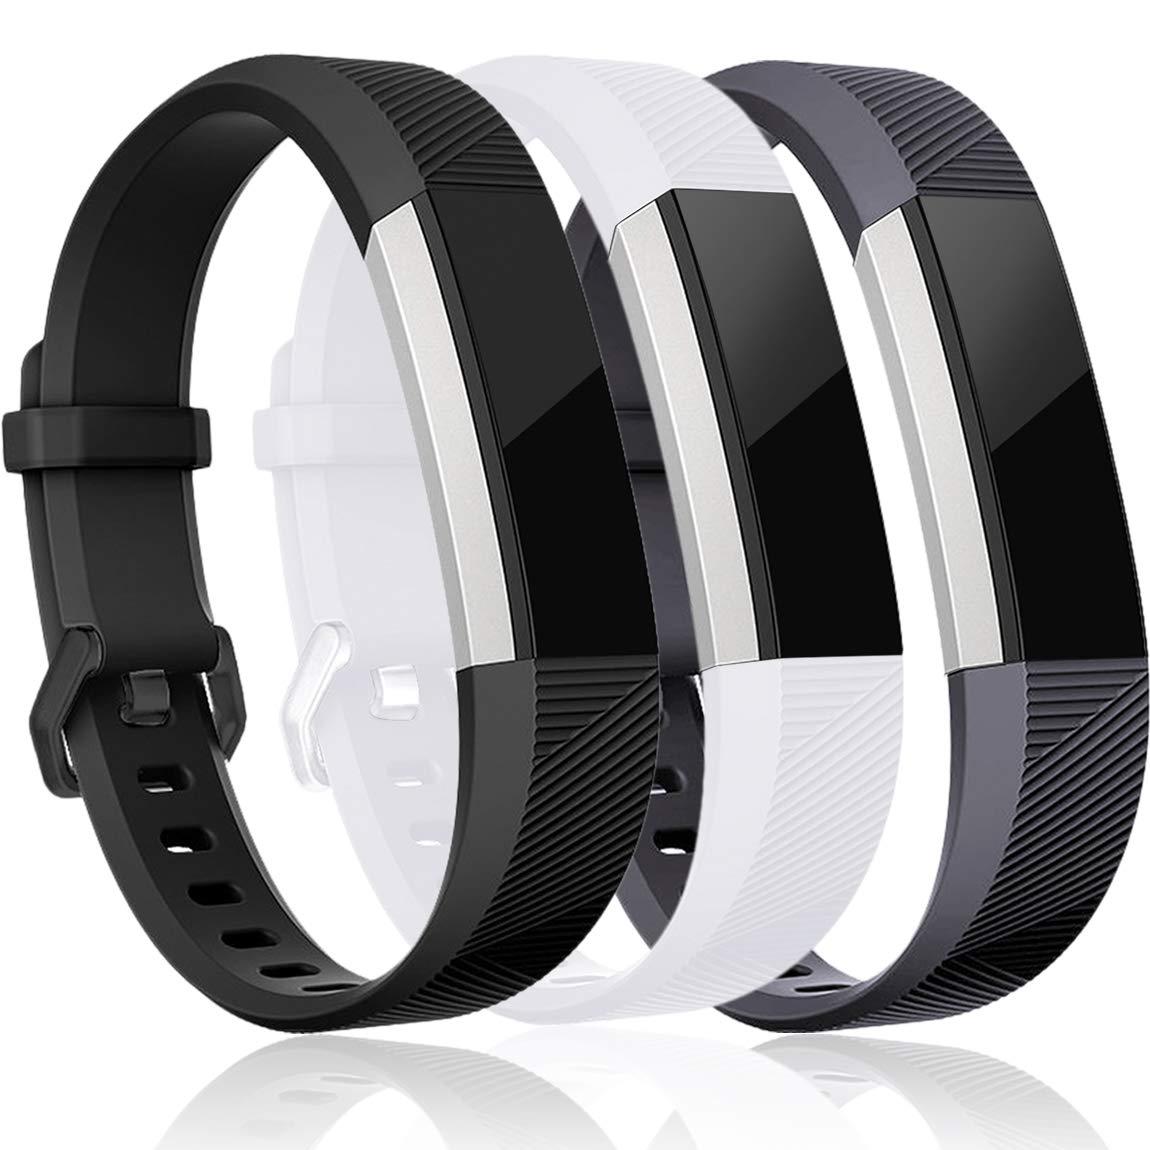 Mallas Para Reloj Fitbit Alta, Alta Hr Y Fitbit Ace (3 Un.)